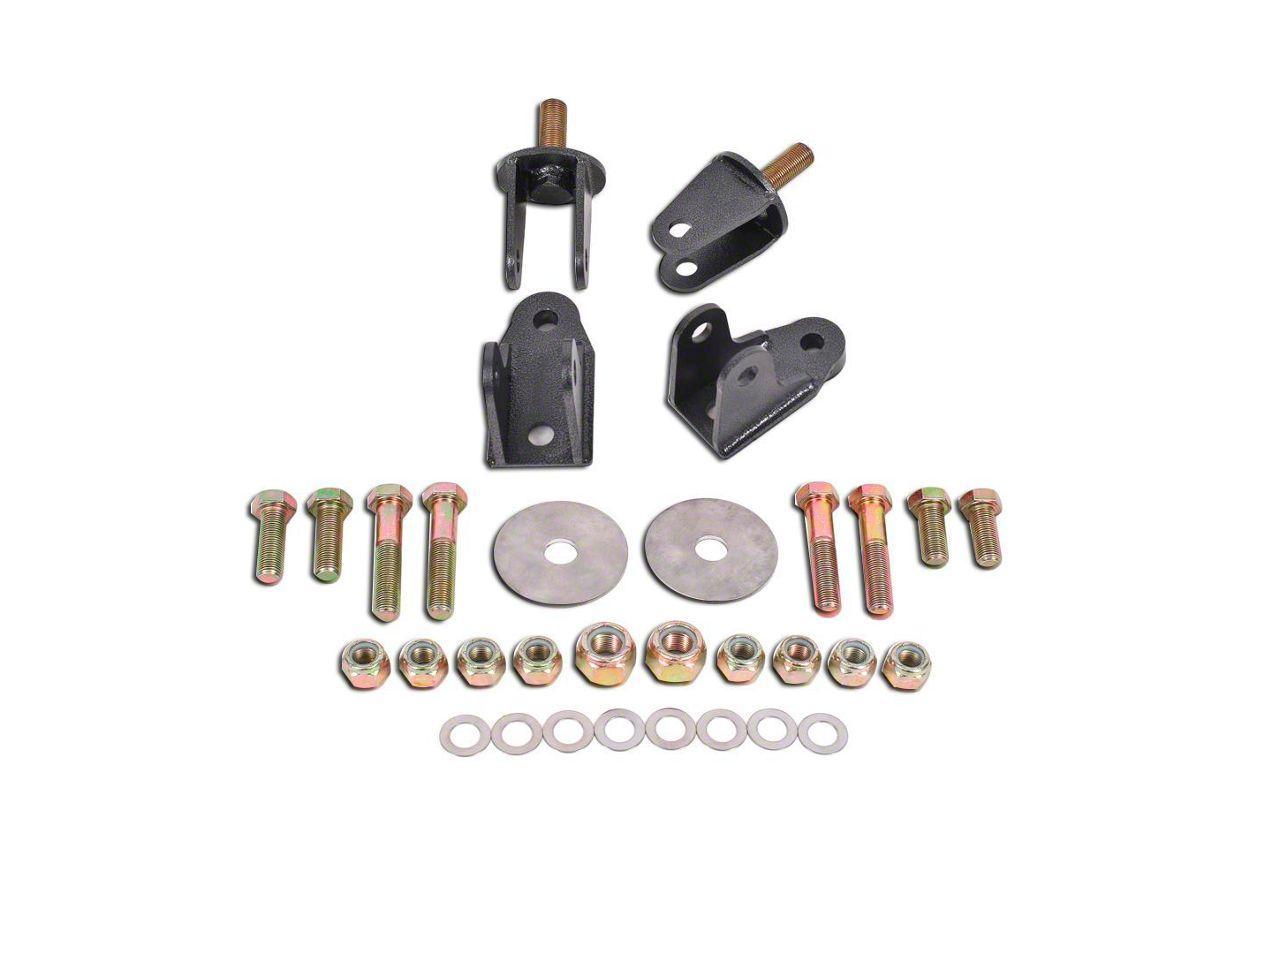 BMR Rear Coil-over Conversion Kit - Hammertone (79-04 All, Excluding 99-04 Cobra)